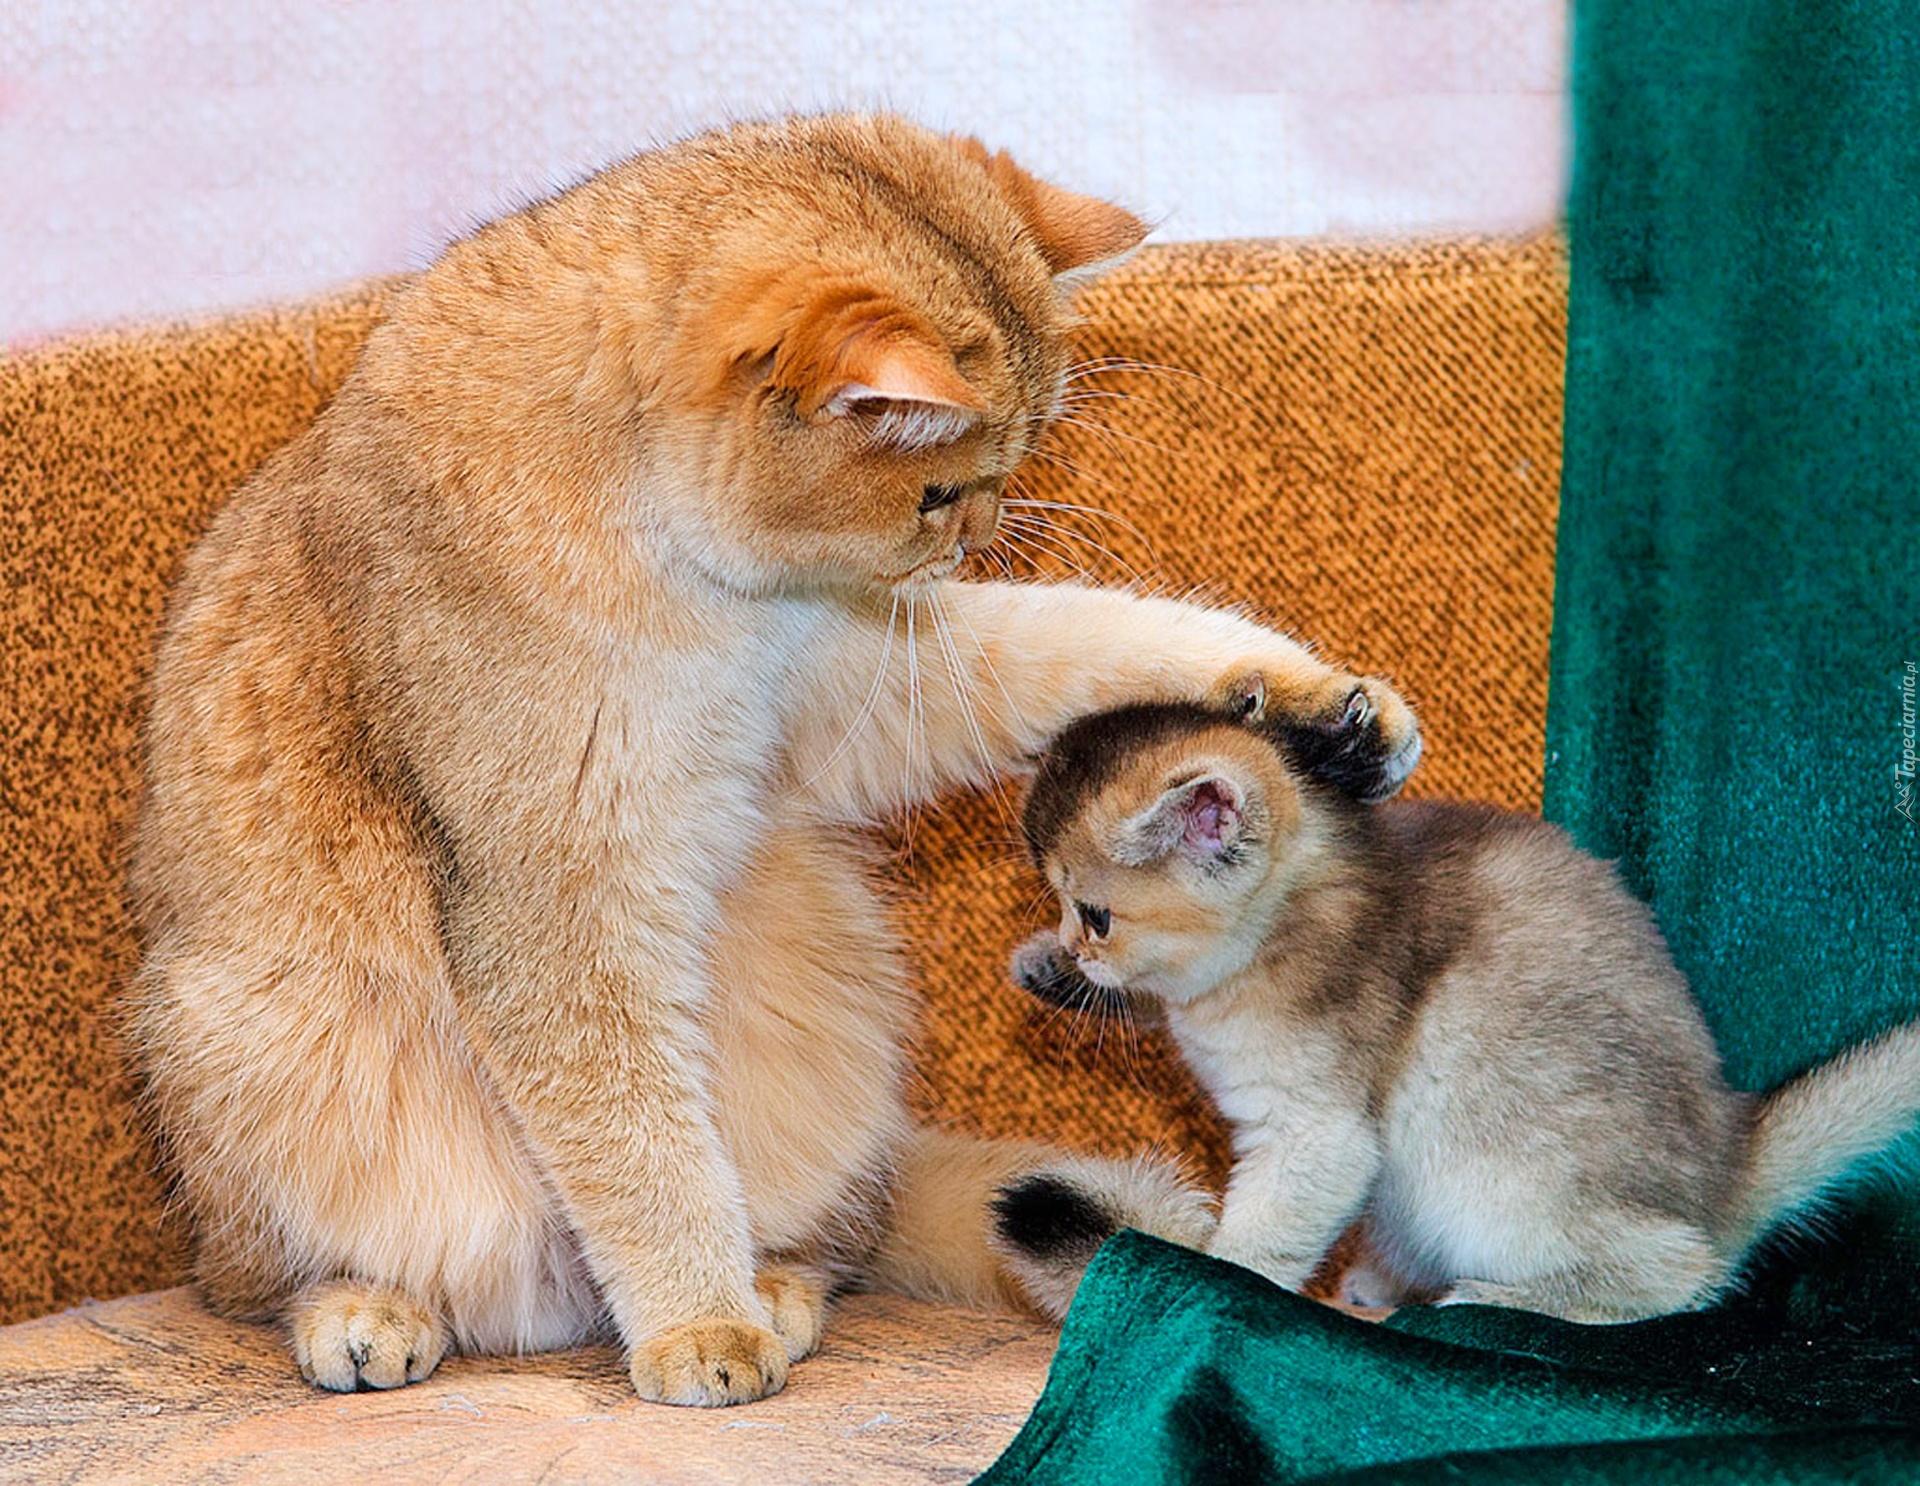 Kocica, Mały, Kotek